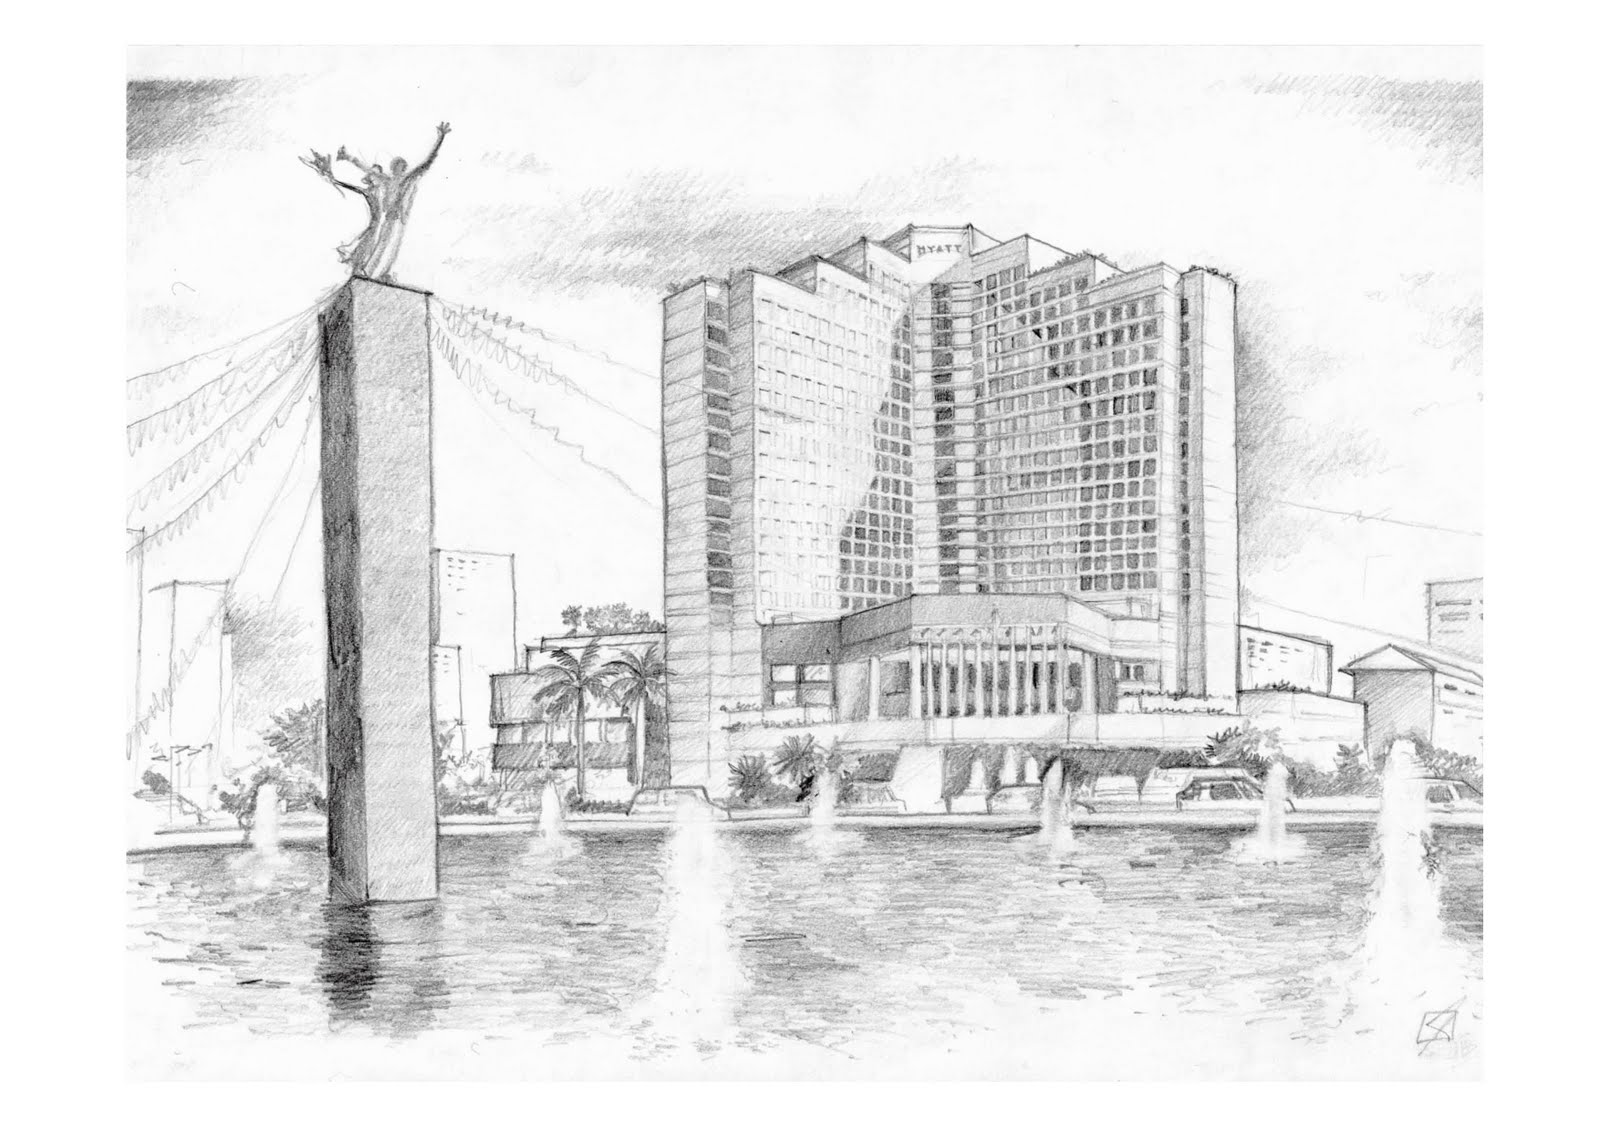 Kumpulan Gambar Sketsa Bangunan Patung